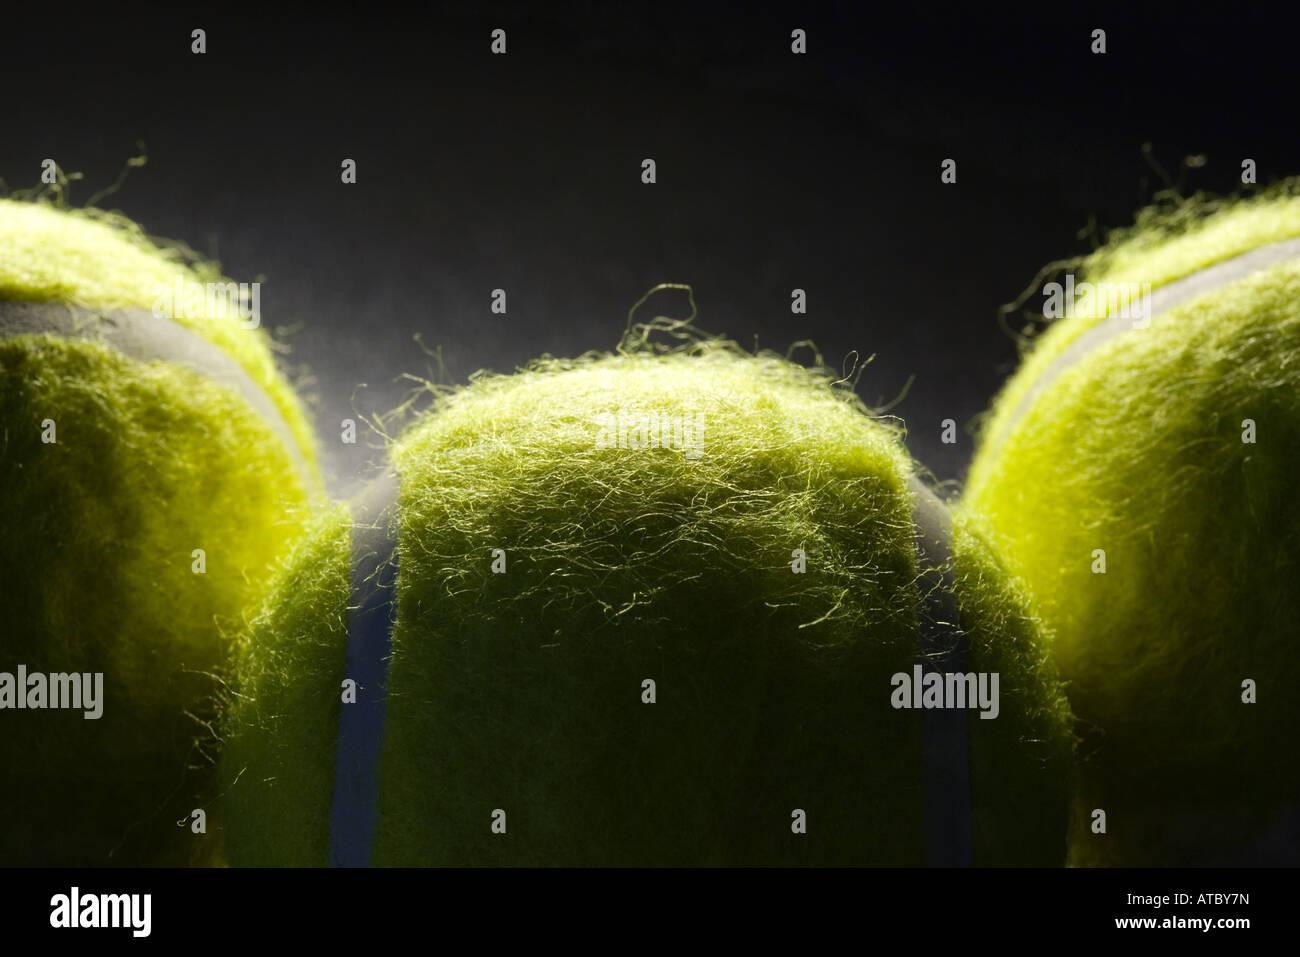 Drei Tennisbälle, extreme Nahaufnahme Stockbild